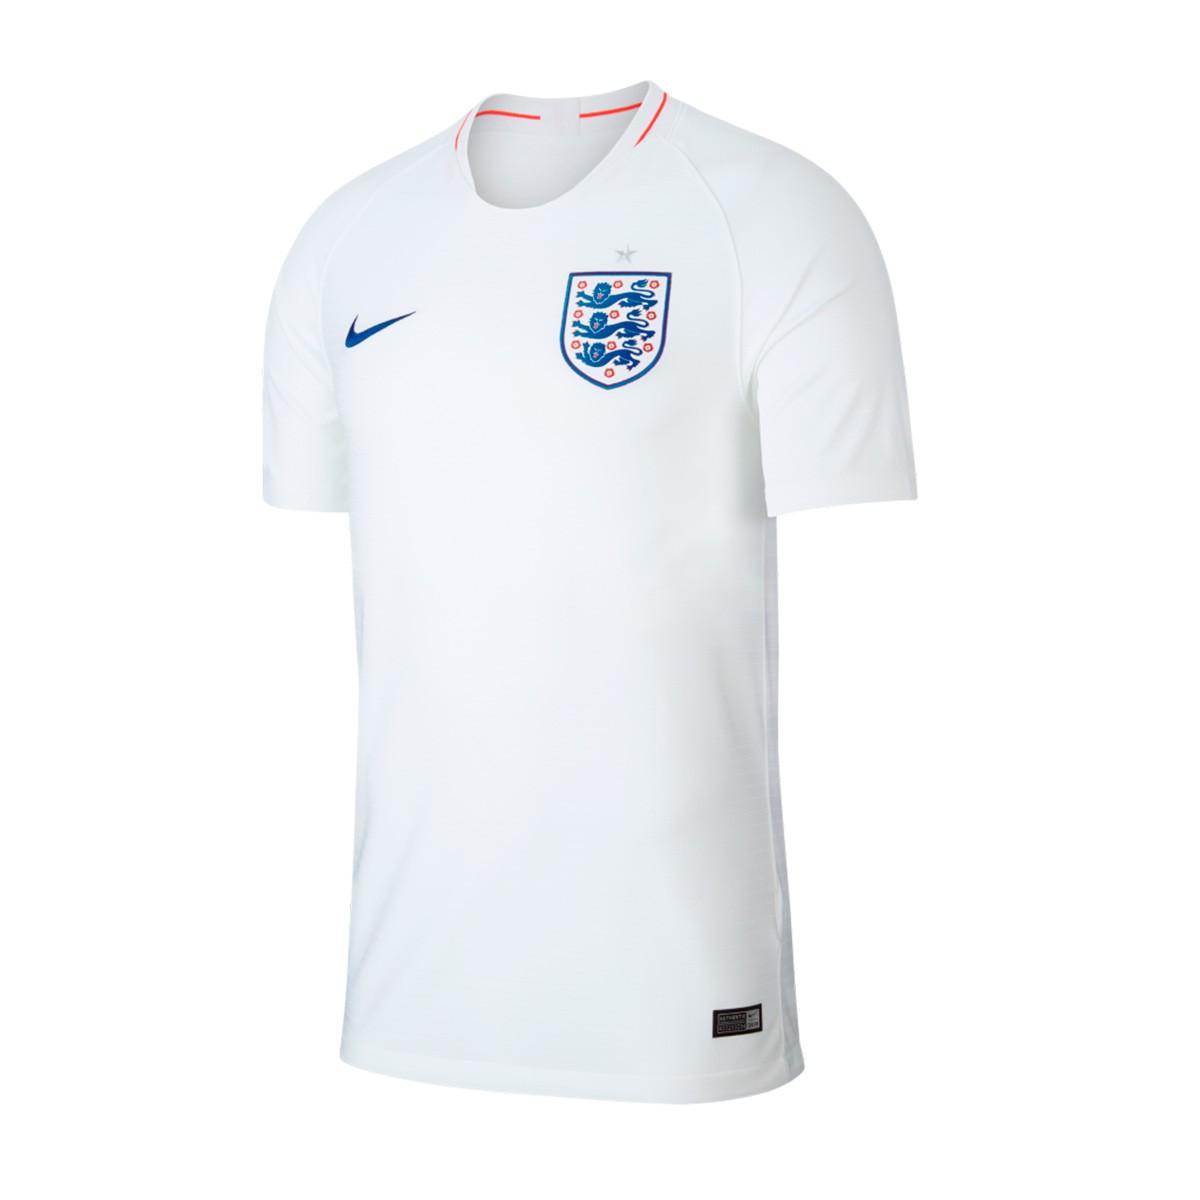 67550cbd07cd8 Camiseta Nike Inglaterra Breathe Stadium Primera Equipación 2018-2019  White-Sport Royal - Tienda de fútbol Fútbol Emotion